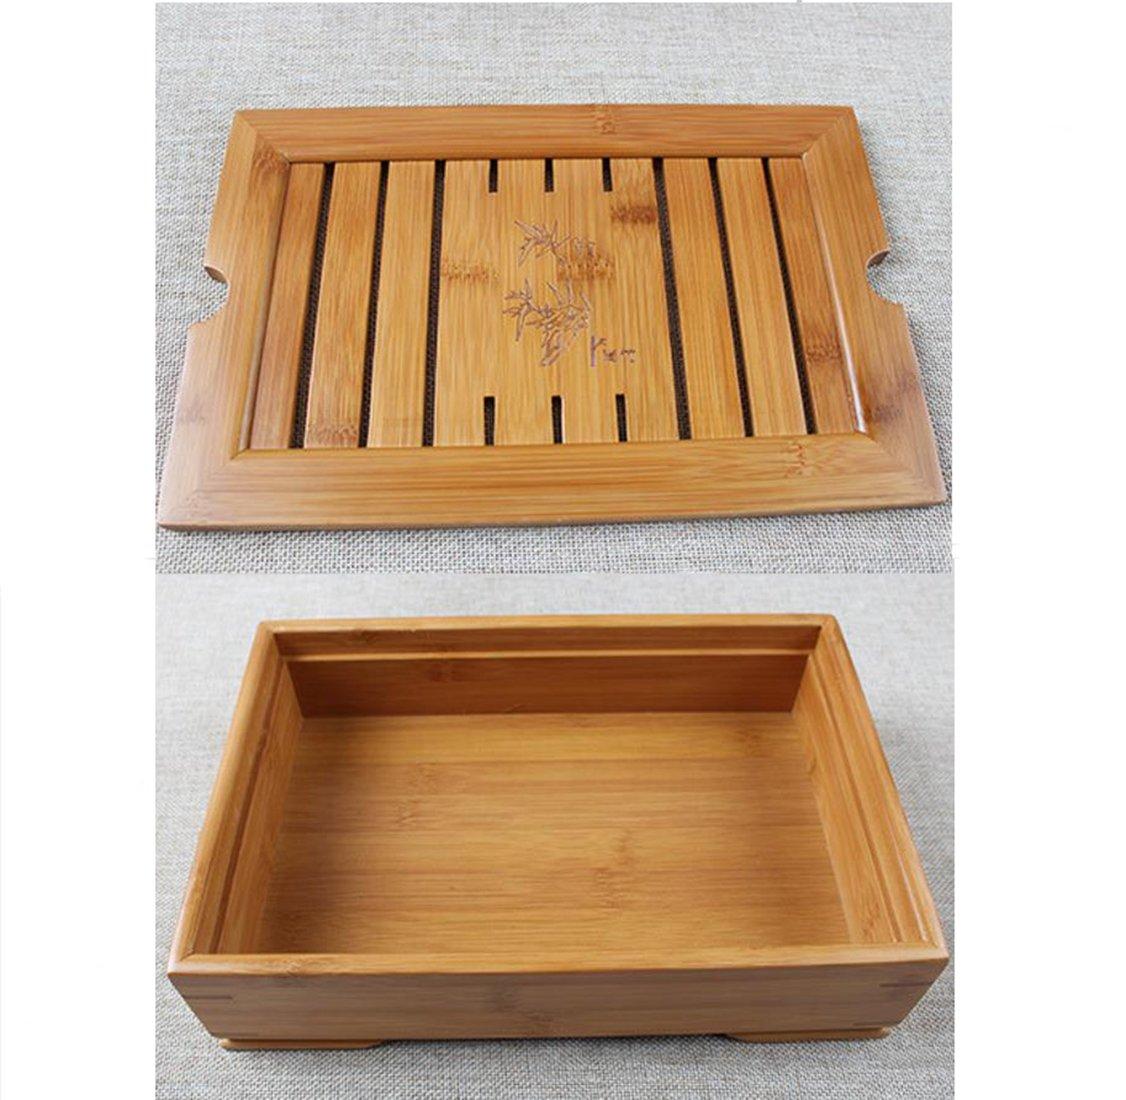 Hoobar Reservoir Type Bamboo Tea Tray - Chinese Kungfu Tea Table Serving Tray Box for Kungfu Tea Set by JKCOM (Image #5)